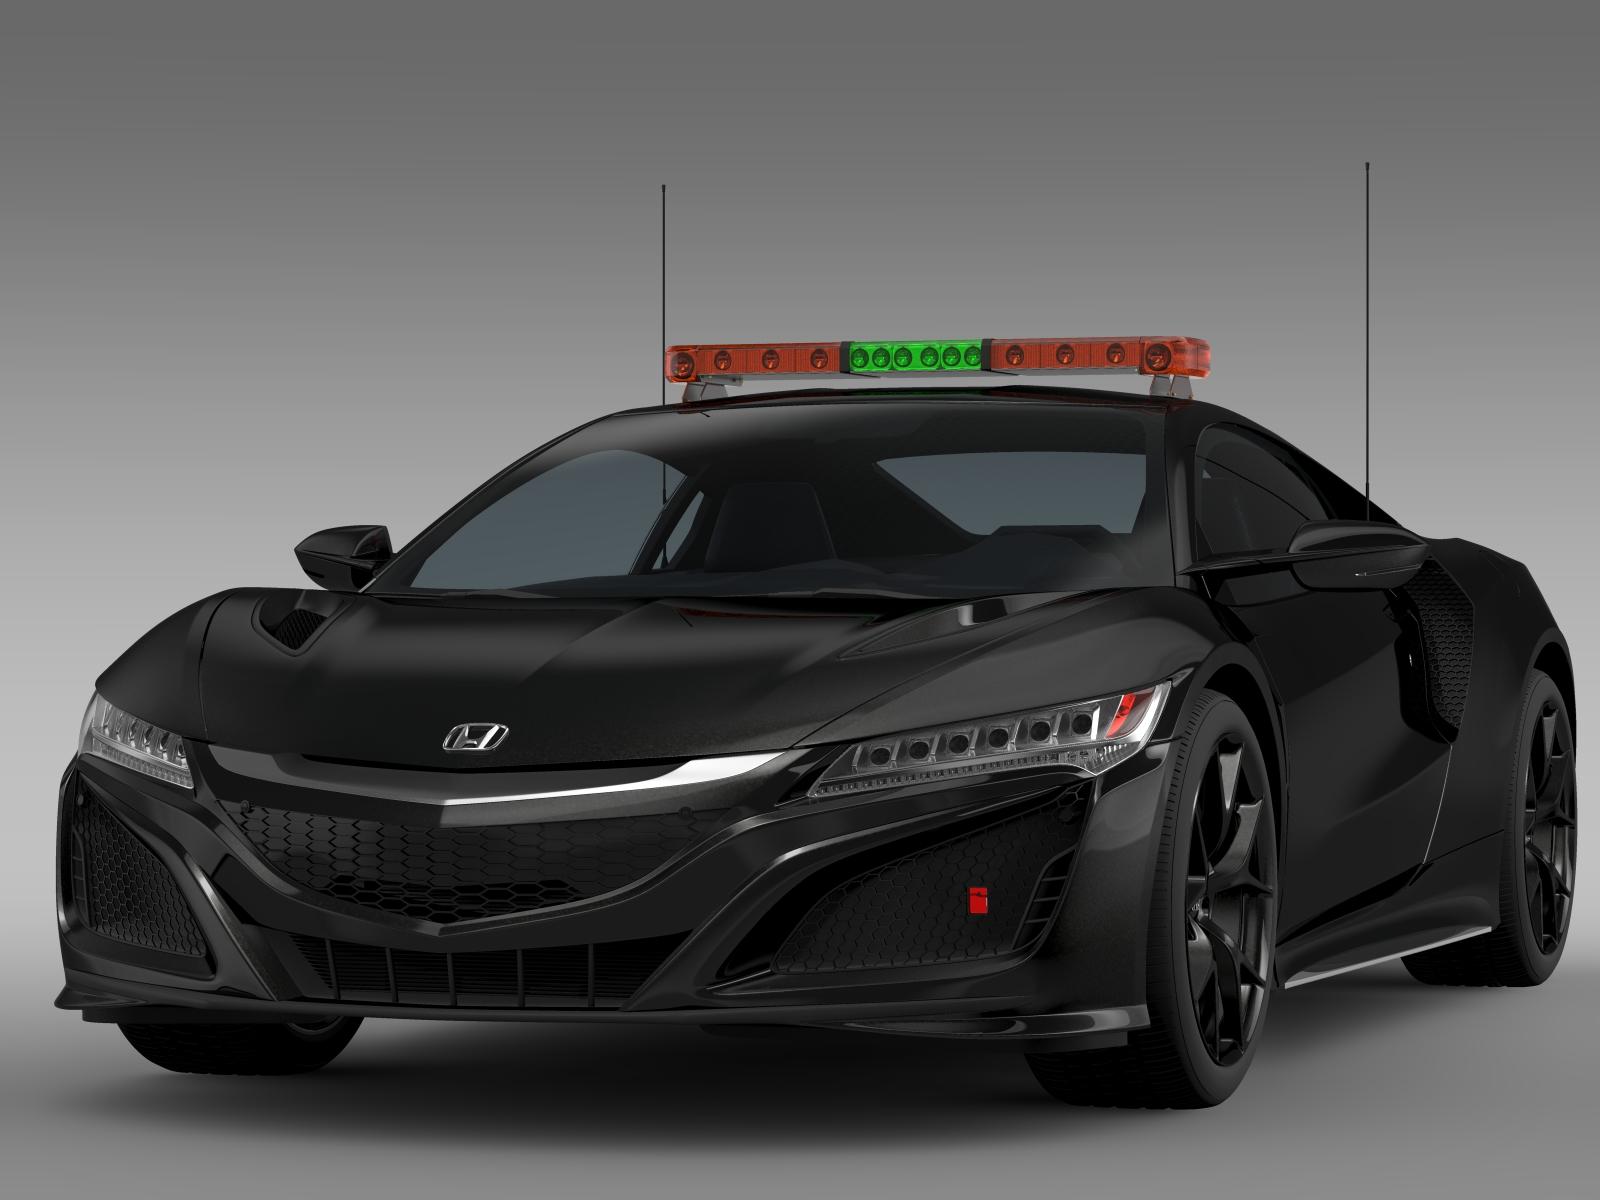 Honda nsx 2016 safety car 3d model buy honda nsx 2016 for Honda 2016 models